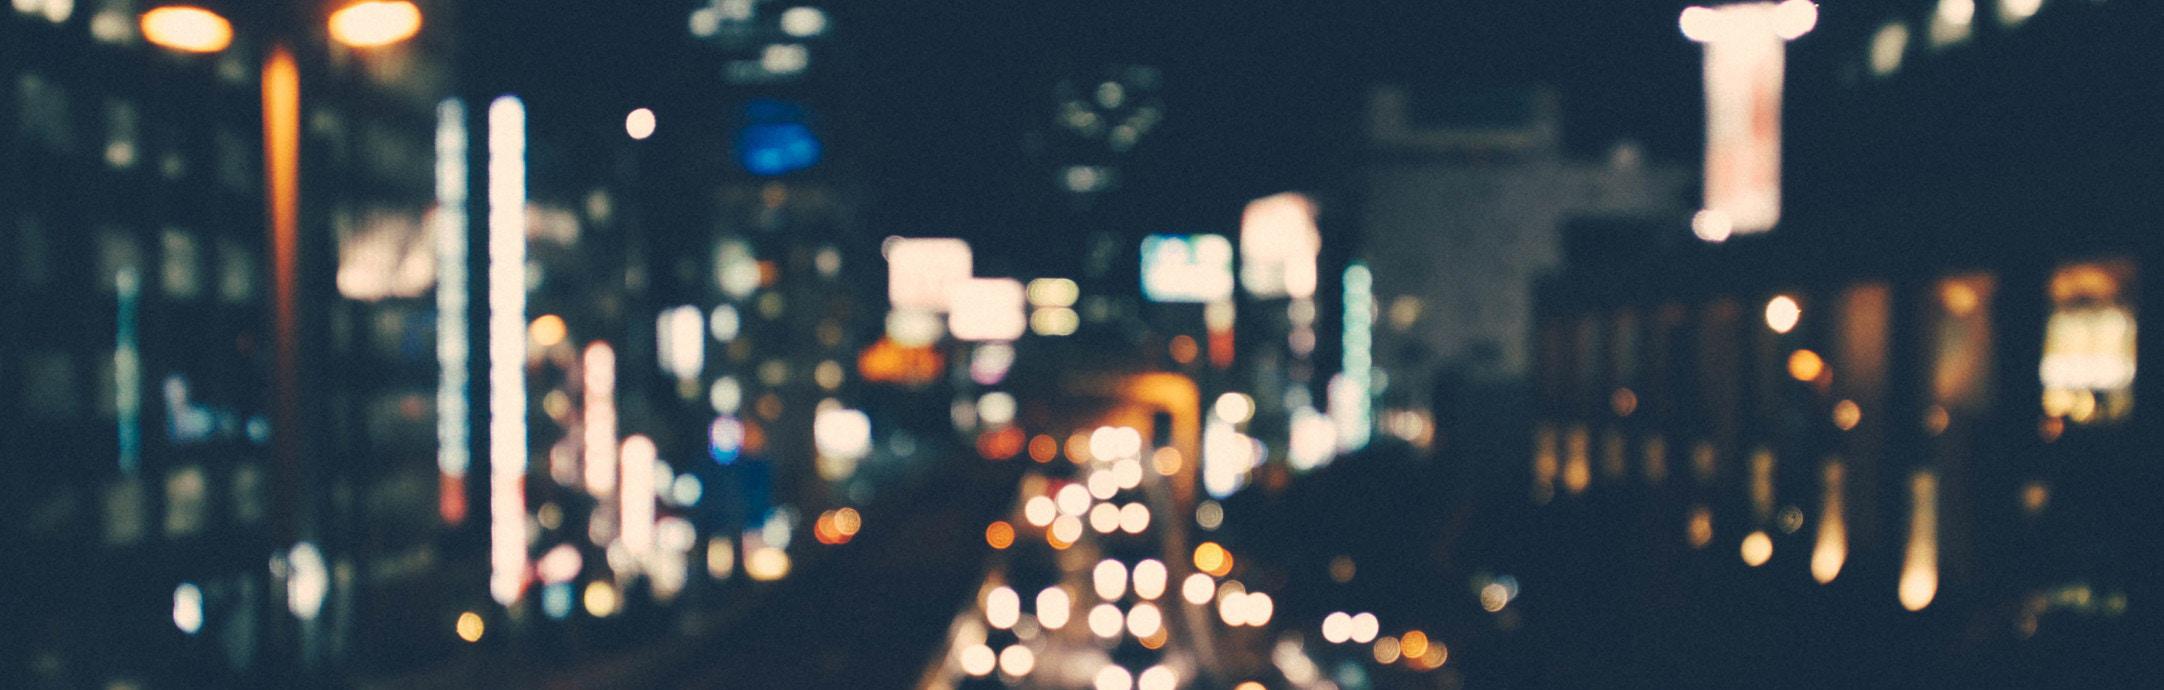 CITYLIGHTS.jpg